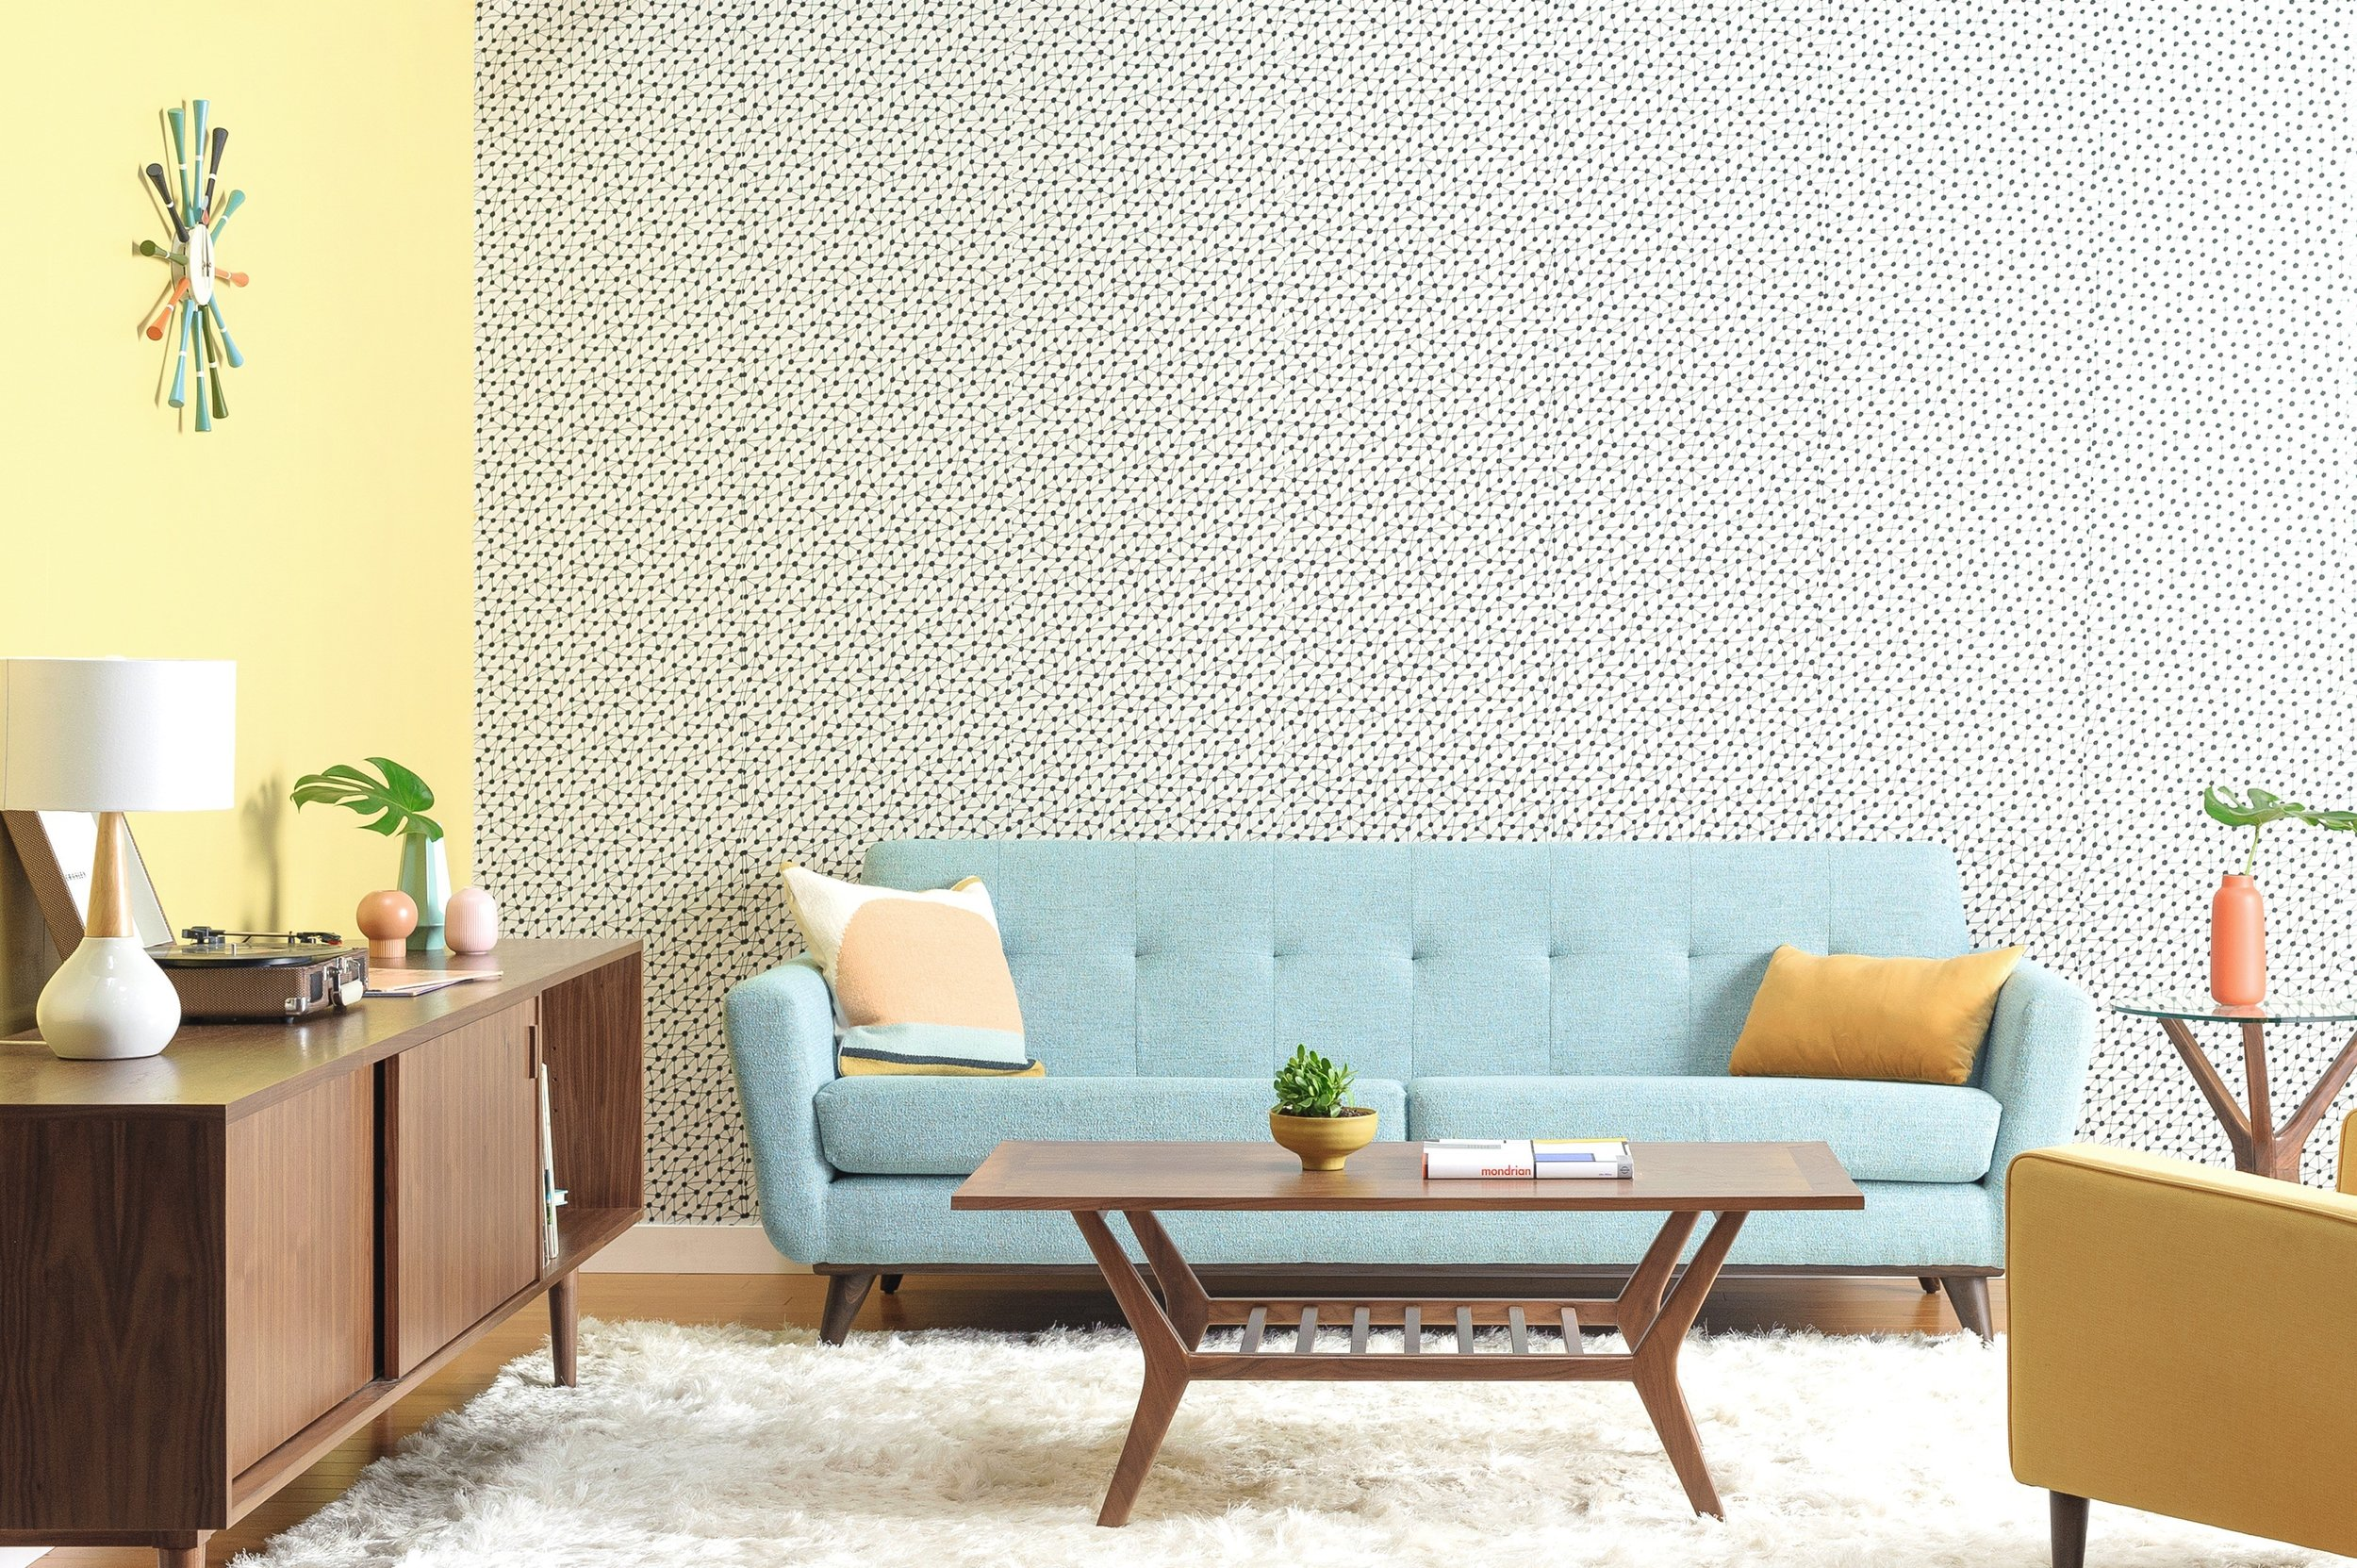 Eco-Friendly-Furniture-Joybird.jpeg